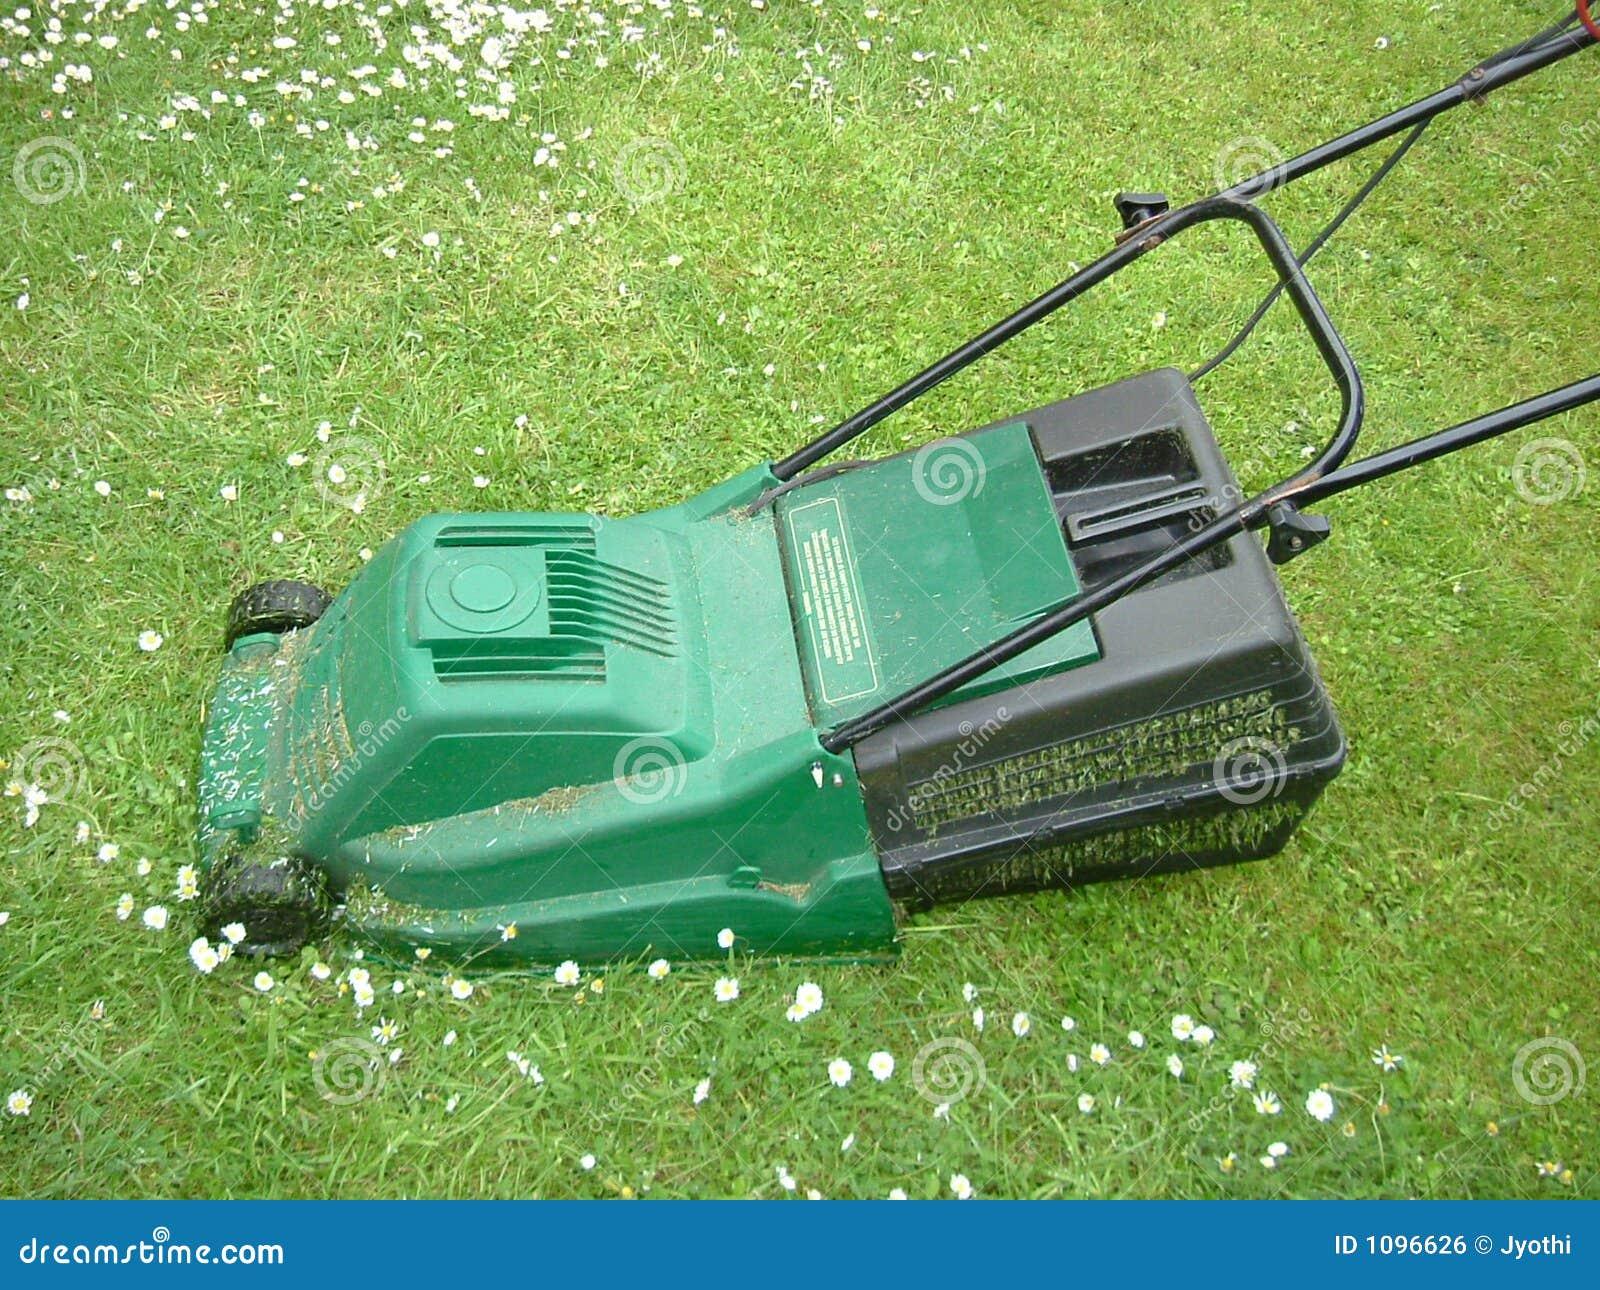 Lawn Mower Seat Trim : Lawn mower stock photo image of trim tool work field